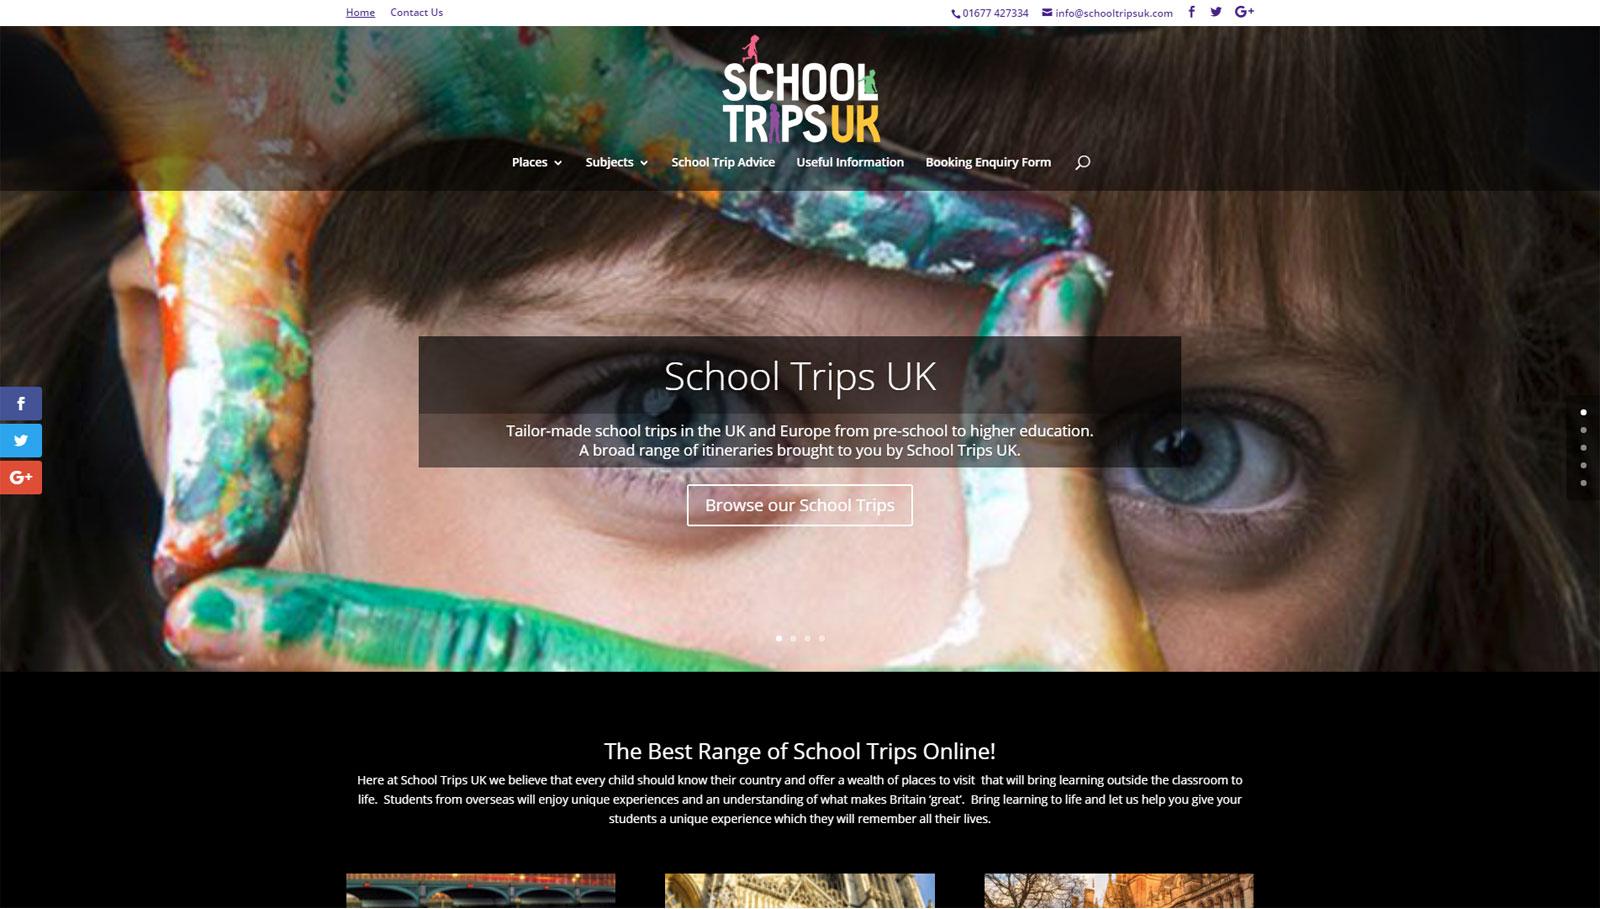 www.schooltripsuk.com